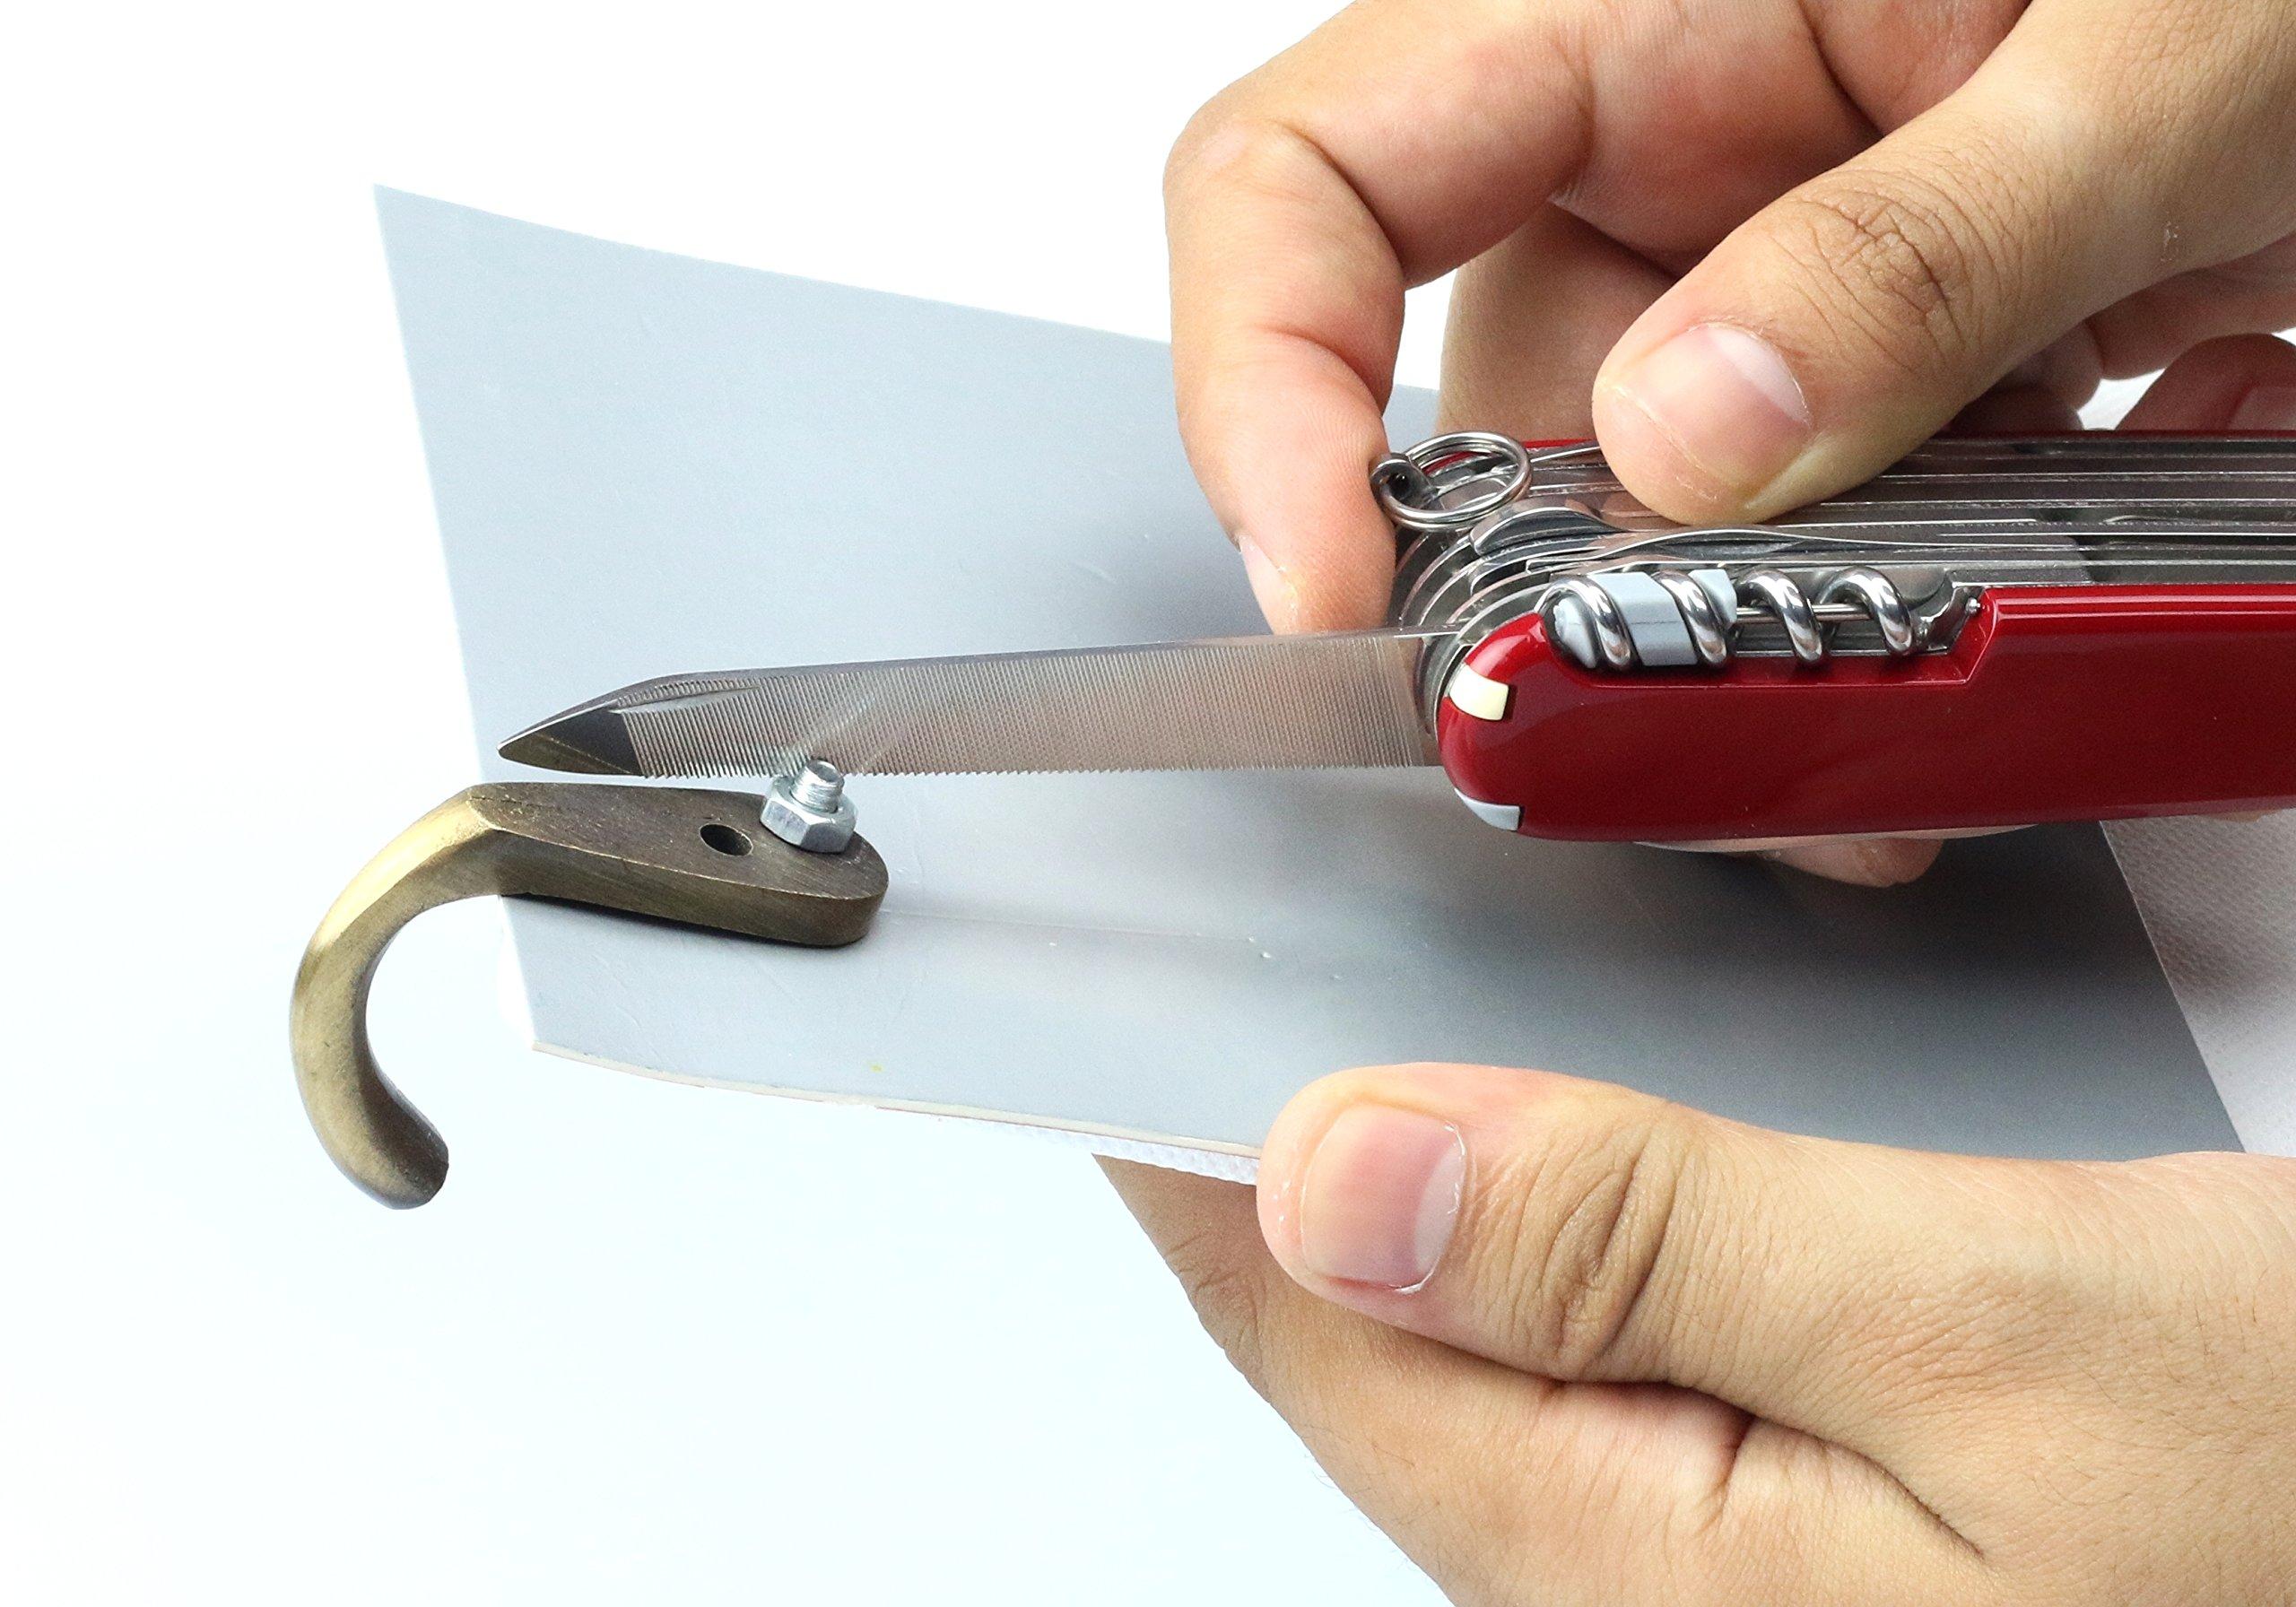 Victorinox Swiss Champ Swiss Army Pocket Knife, Medium, Multi Tool, 33 Functions, Blade, Scissors, Red 30